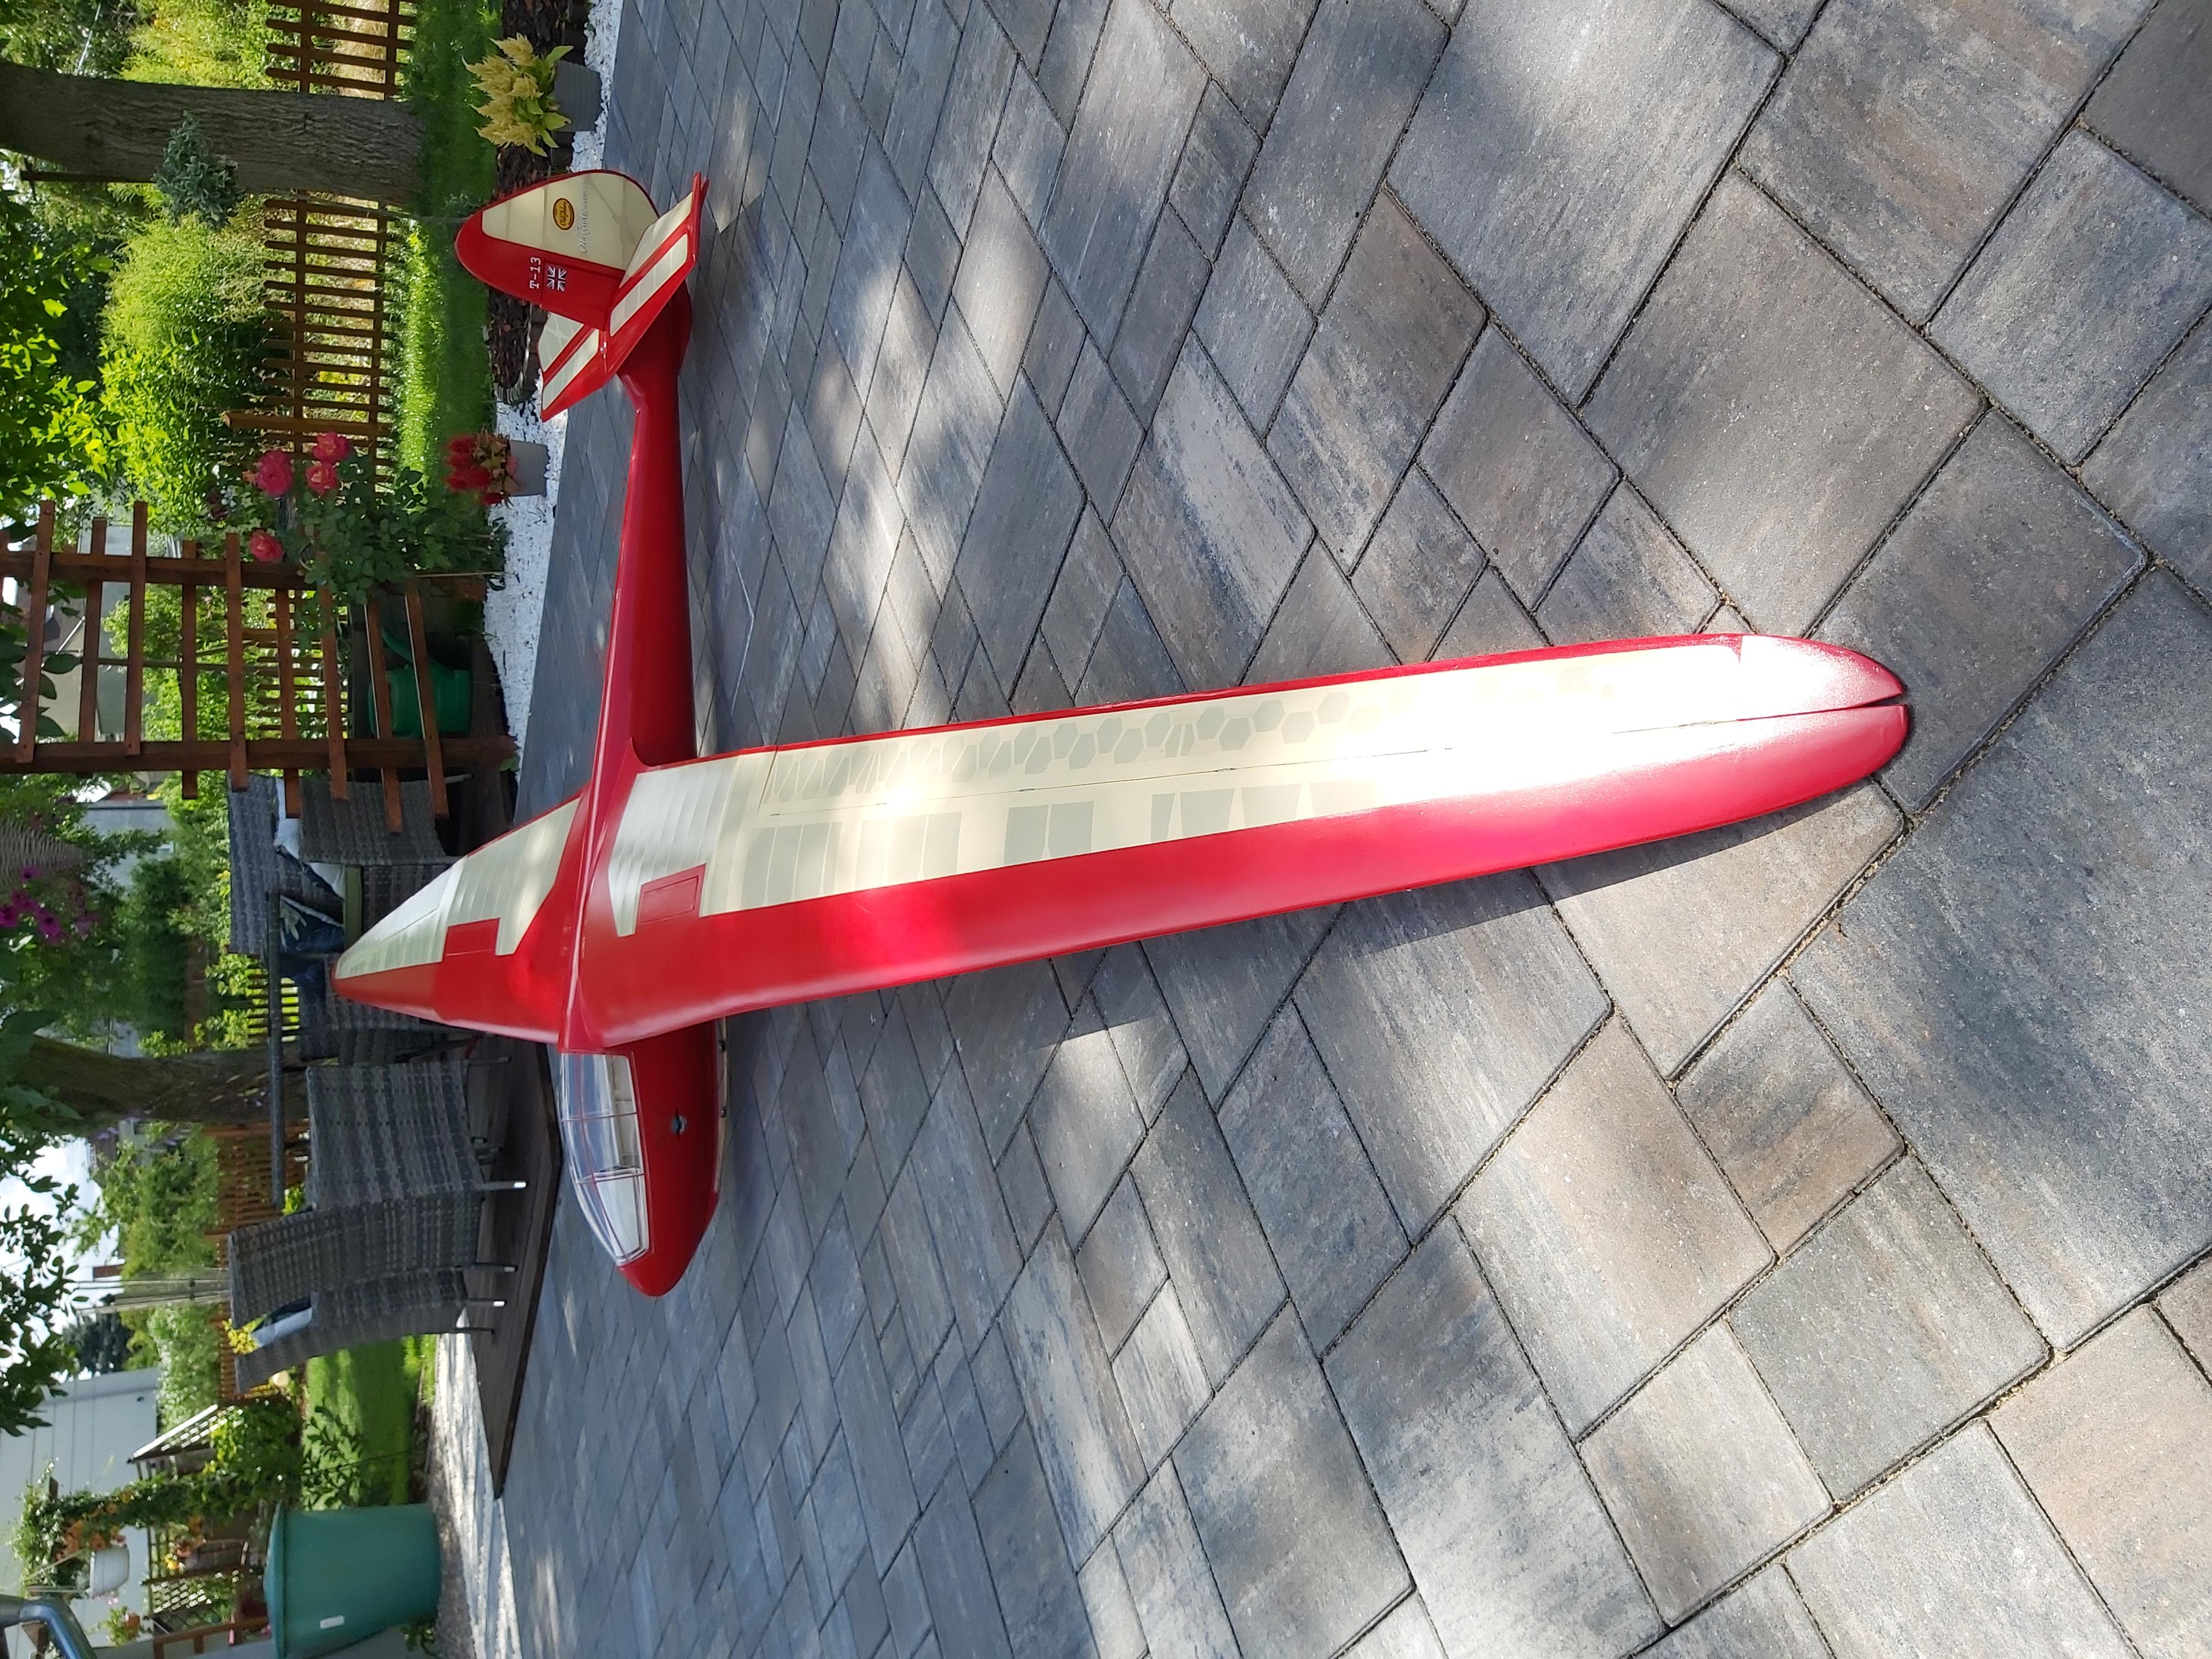 Slingsby T13 Petrel ARF